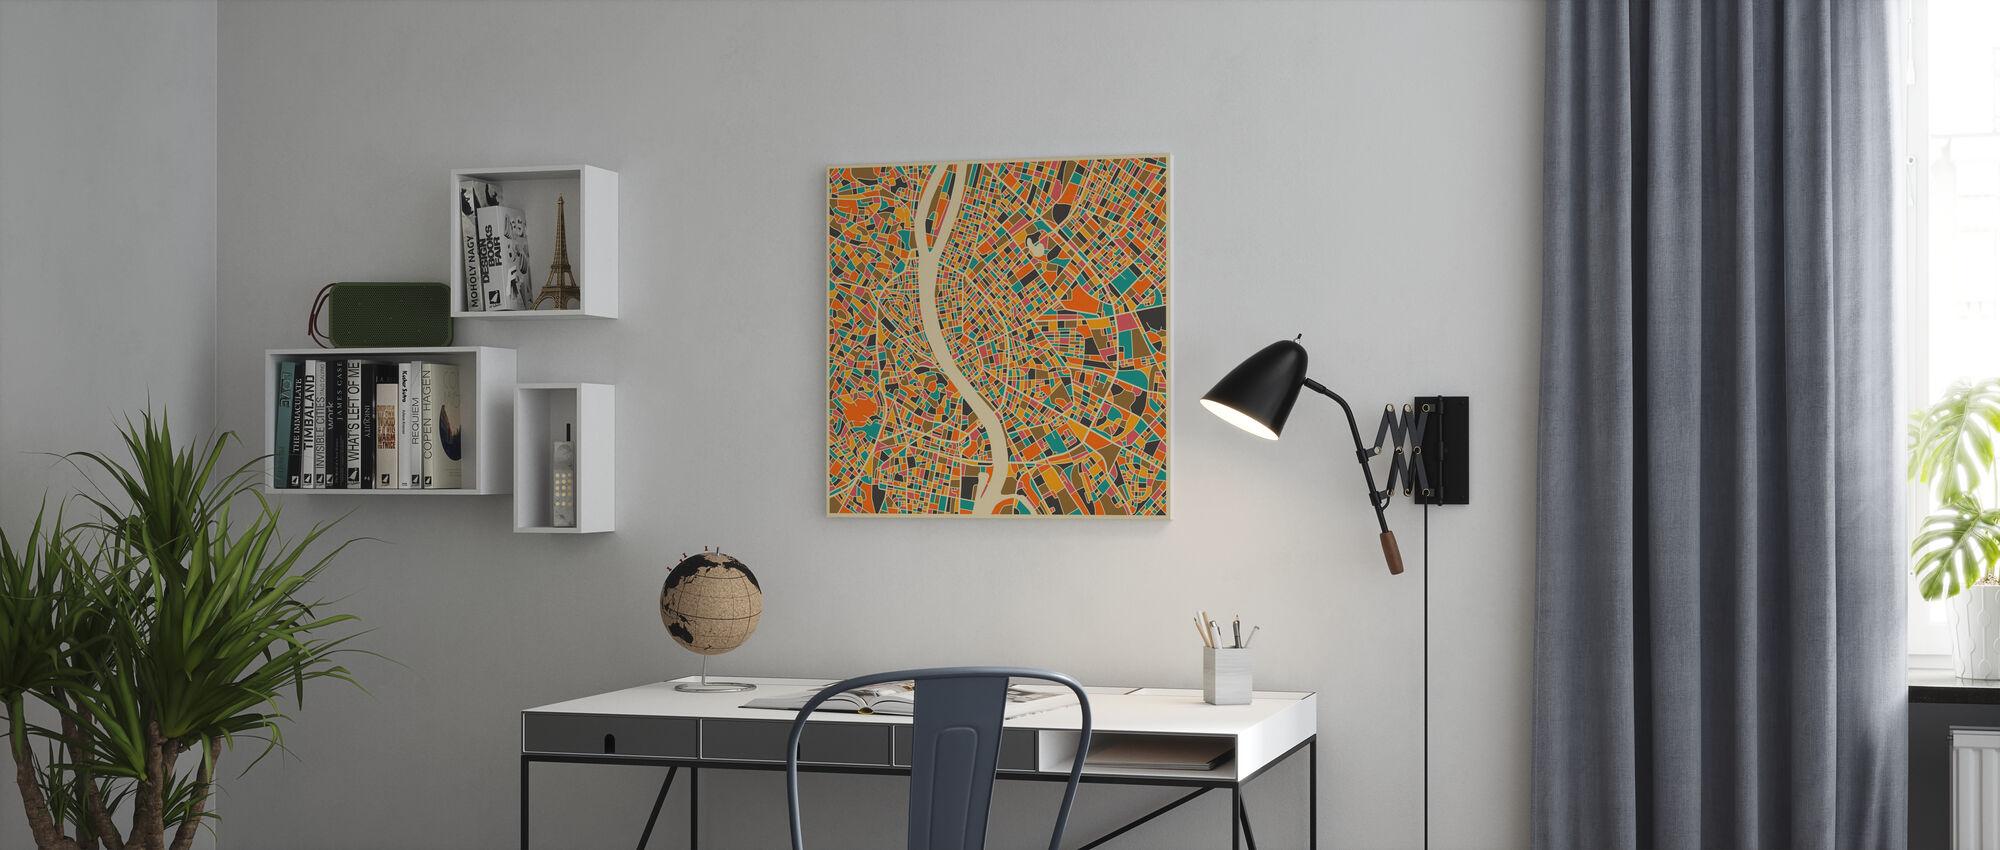 Mehrfarbige Karte - Budapest - Leinwandbild - Büro